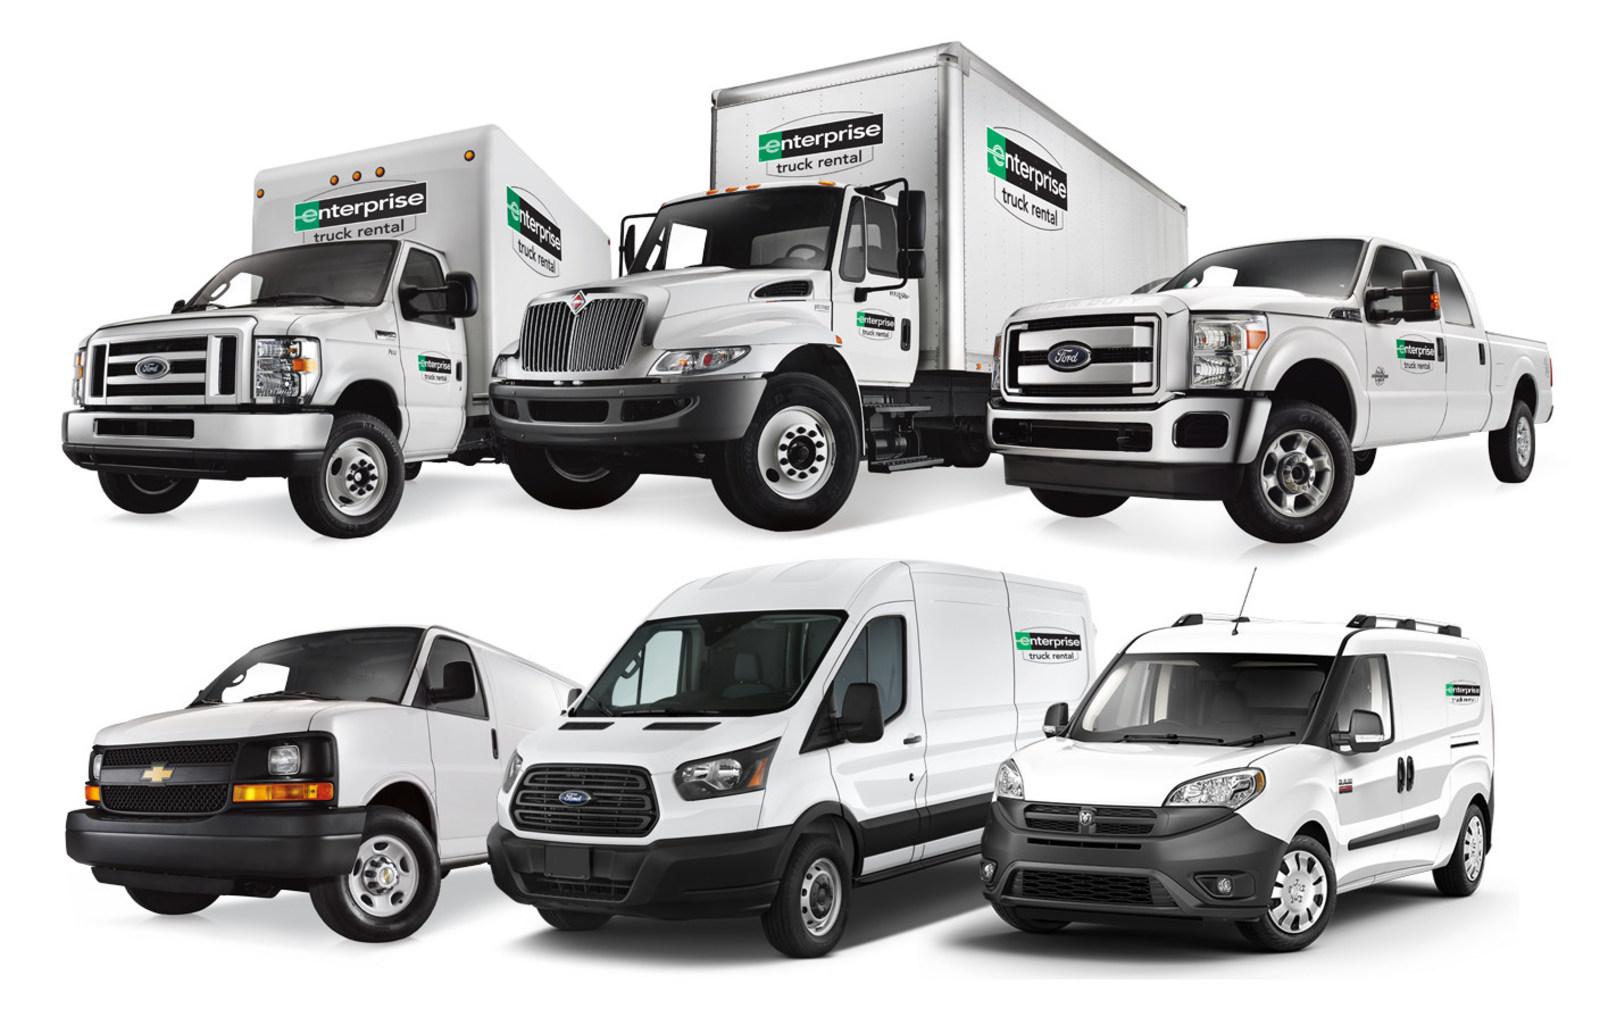 Enterprise Cargo Van >> Q A Enterprise Truck Rental Talks 3x Growth E Commerce Popular